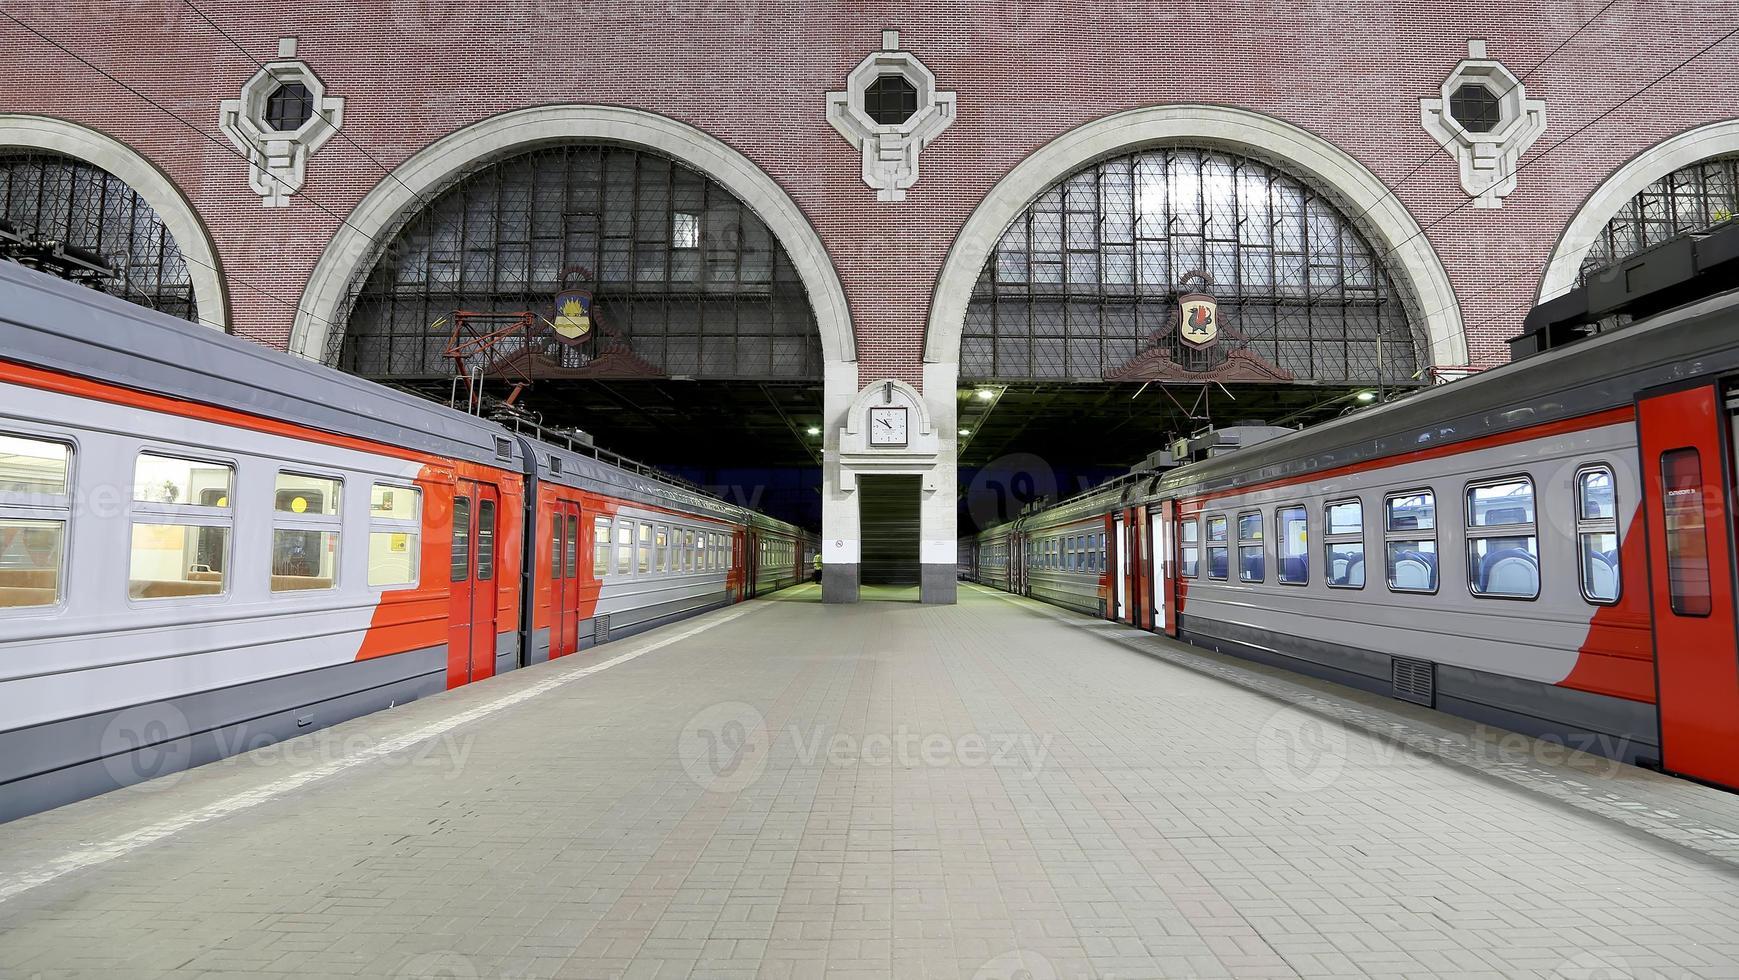 kazansky järnvägsterminal (kazansky vokzal) - Moskva, Ryssland. foto